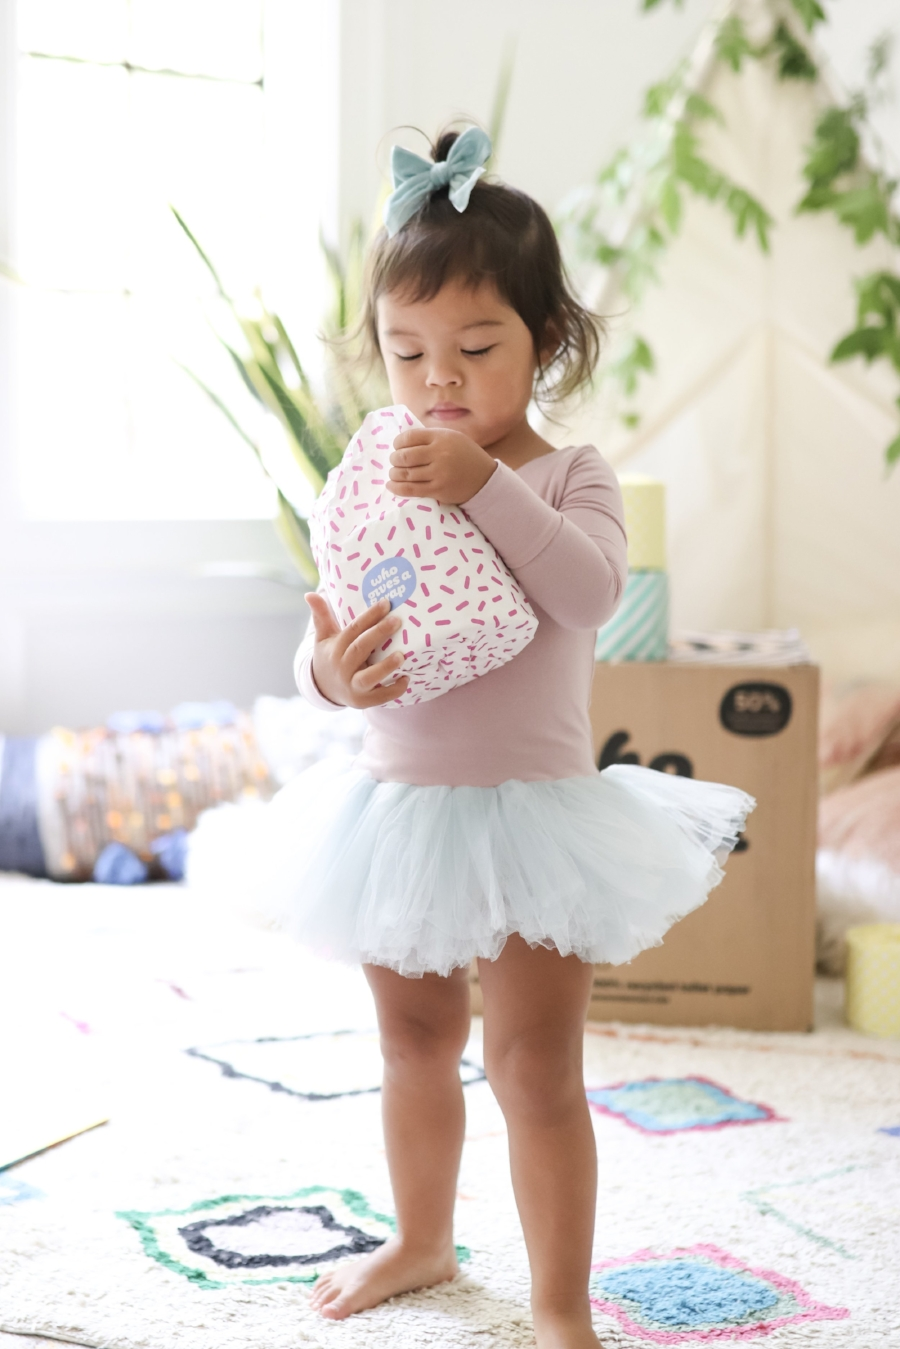 modern motherhood blog healthy living tips recycled toilet paper review joyfullygreen